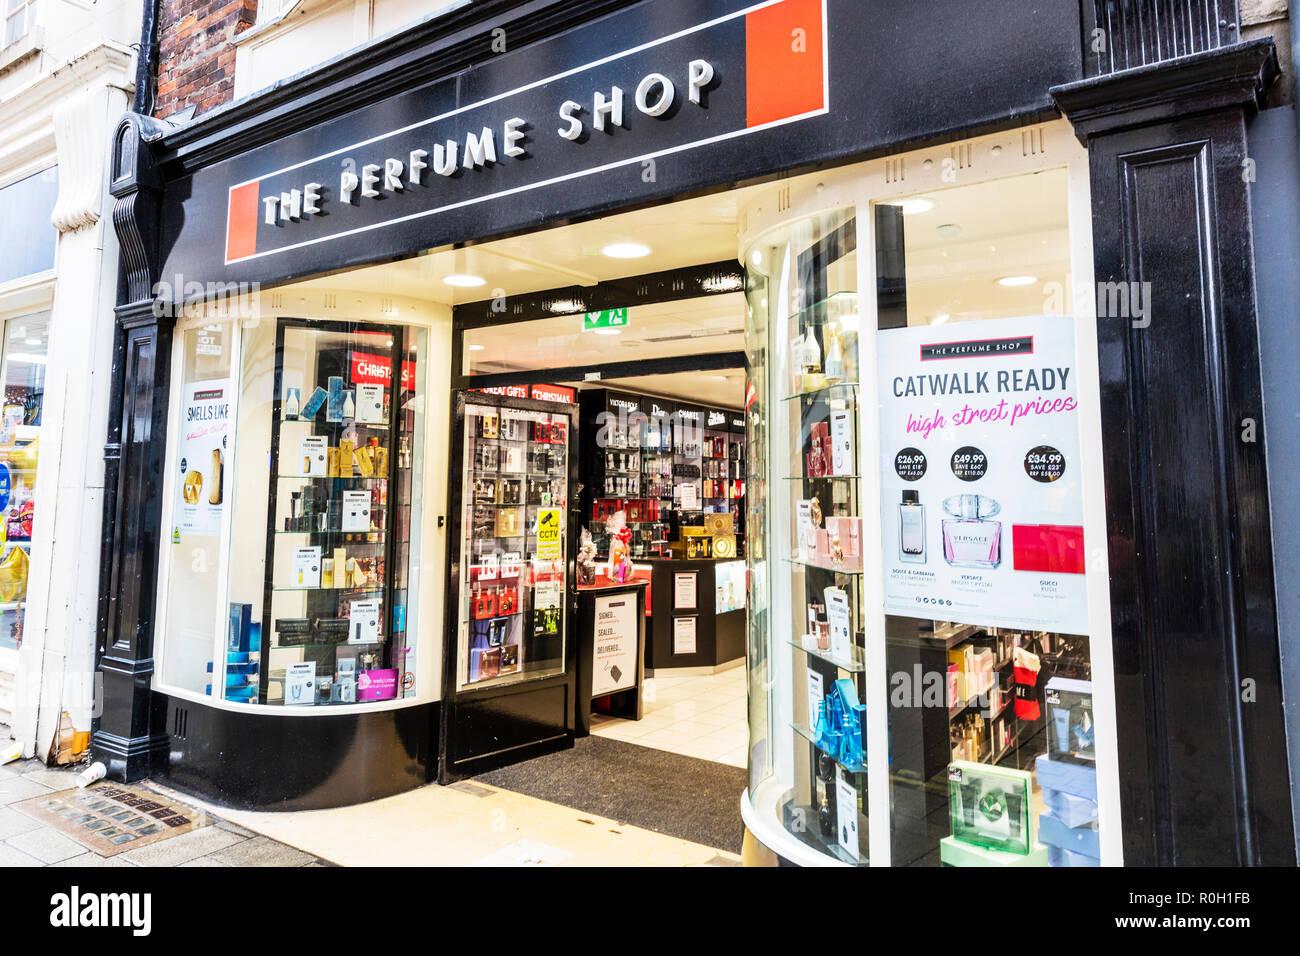 The Perfume Shop high street store UK, The Perfume Shop business, The Perfume Shop logo, The Perfume Shop sign, The Perfume Shop display, The Perfume Stock Photo